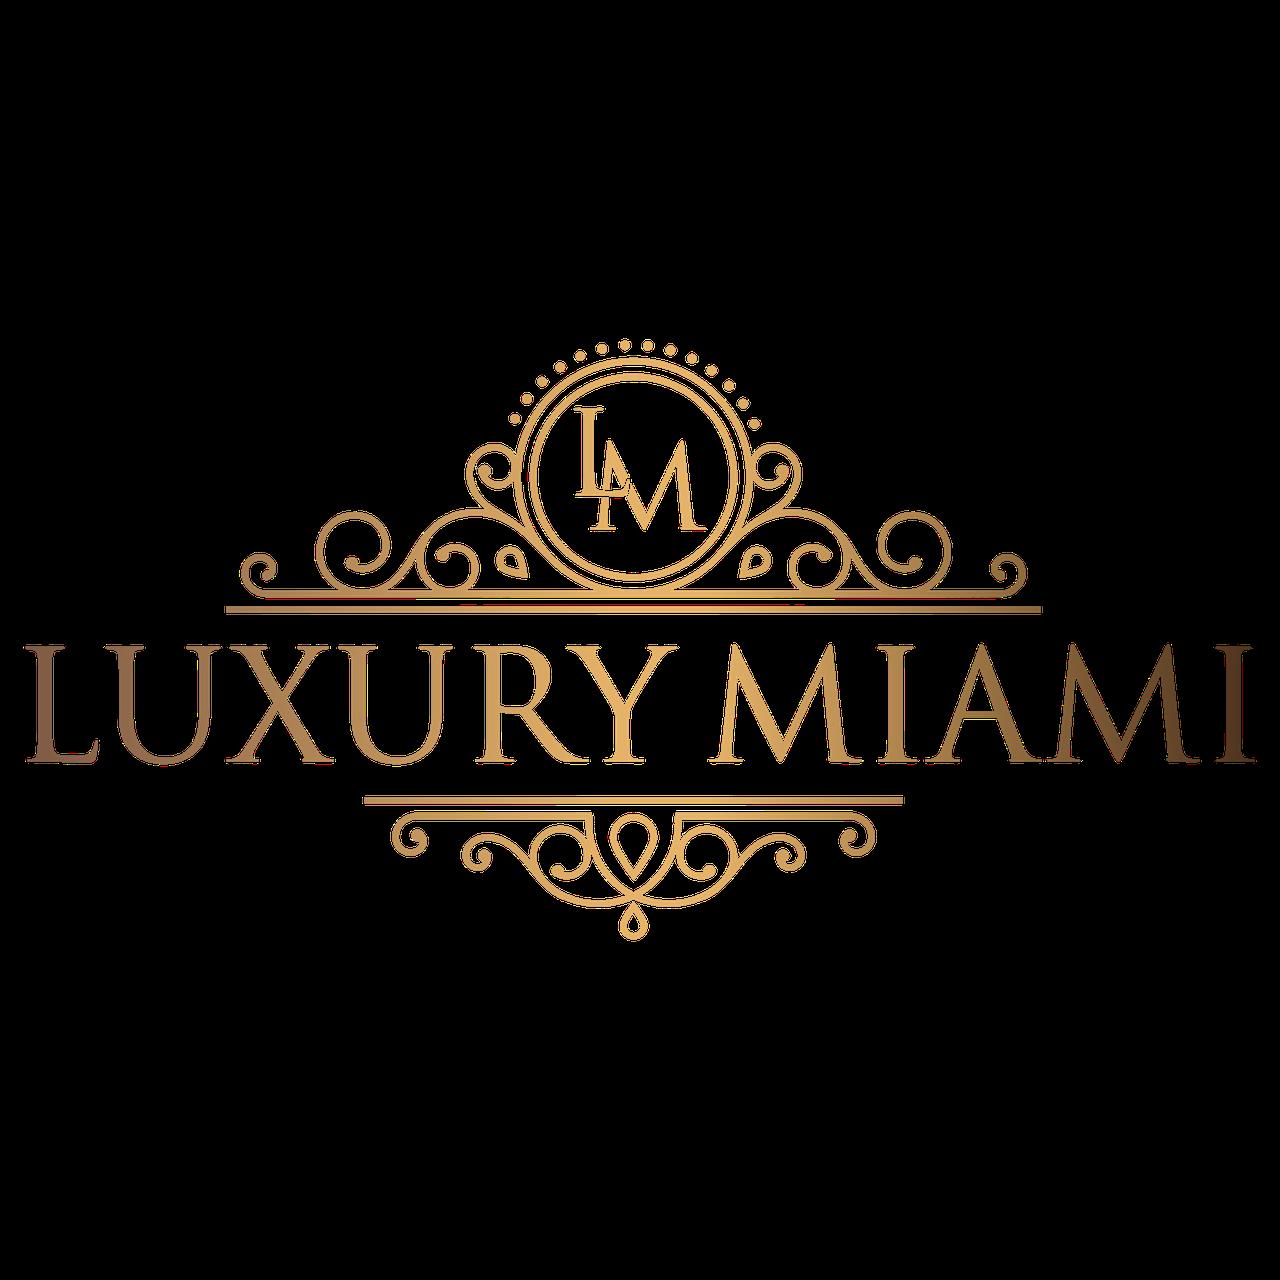 Luxury Miami Co